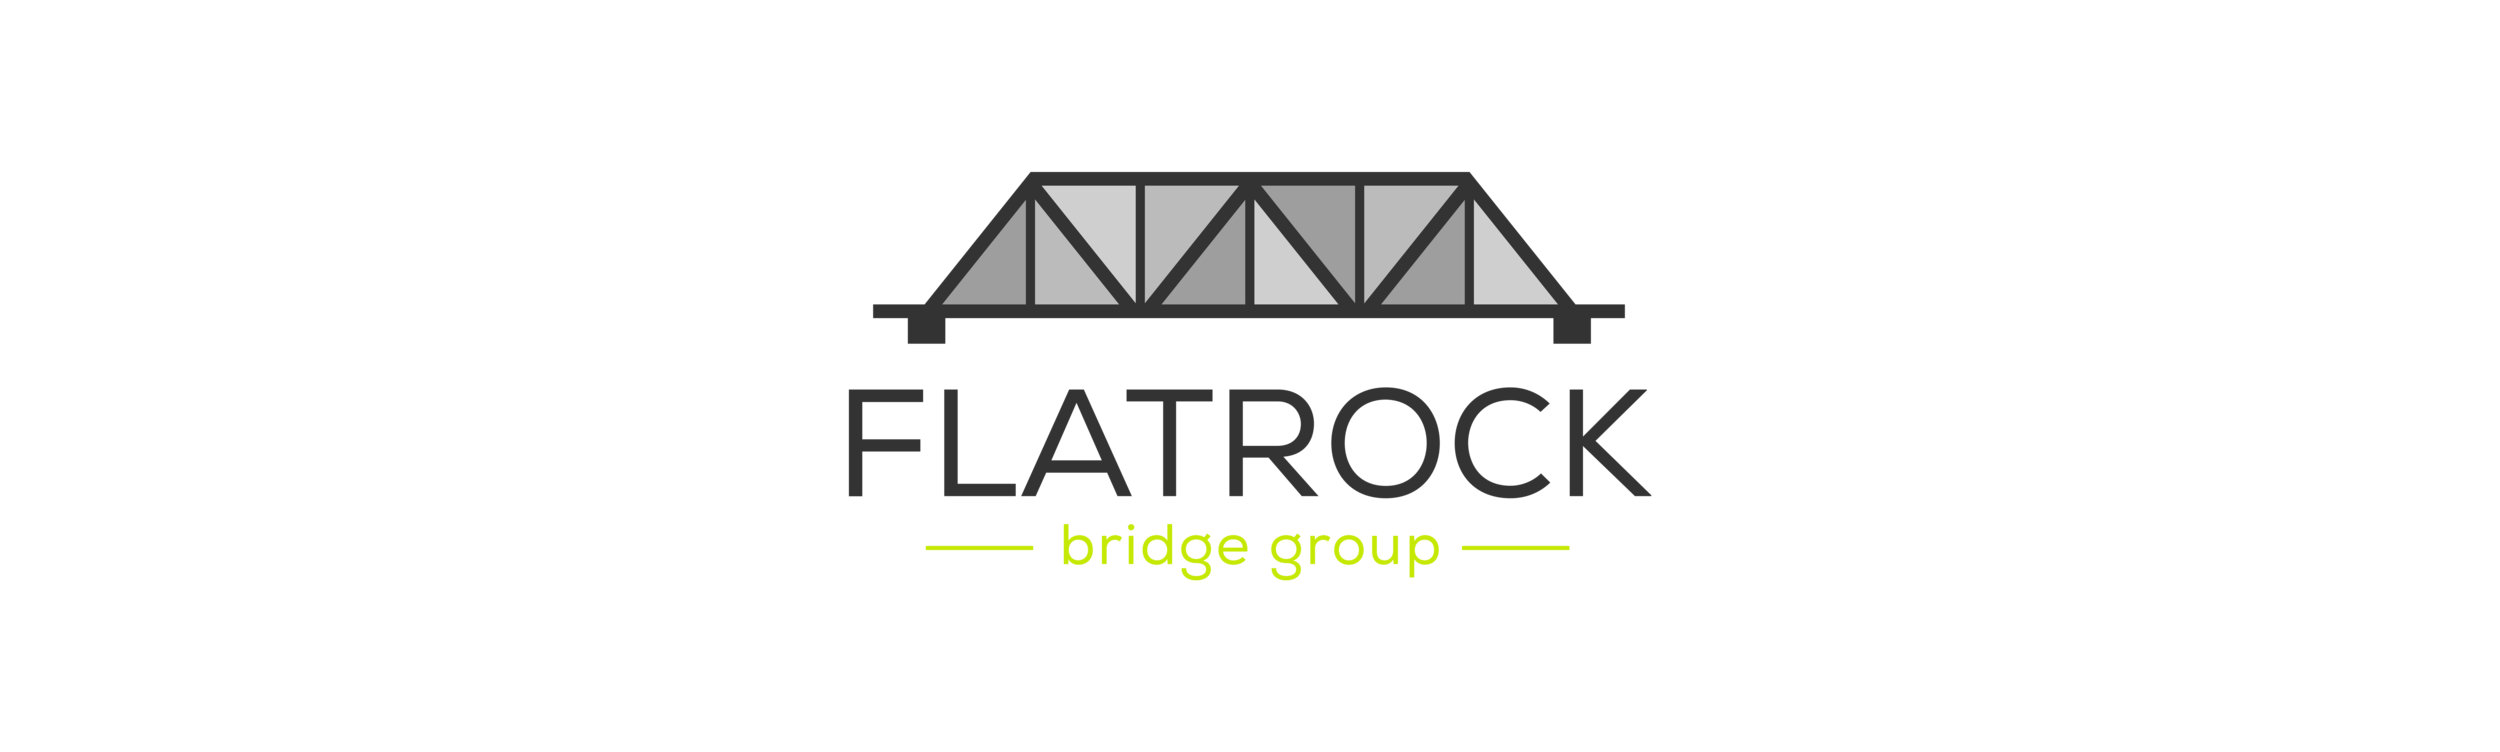 Flatrock Bridge Group Logo_Large_Dark33 copy.png